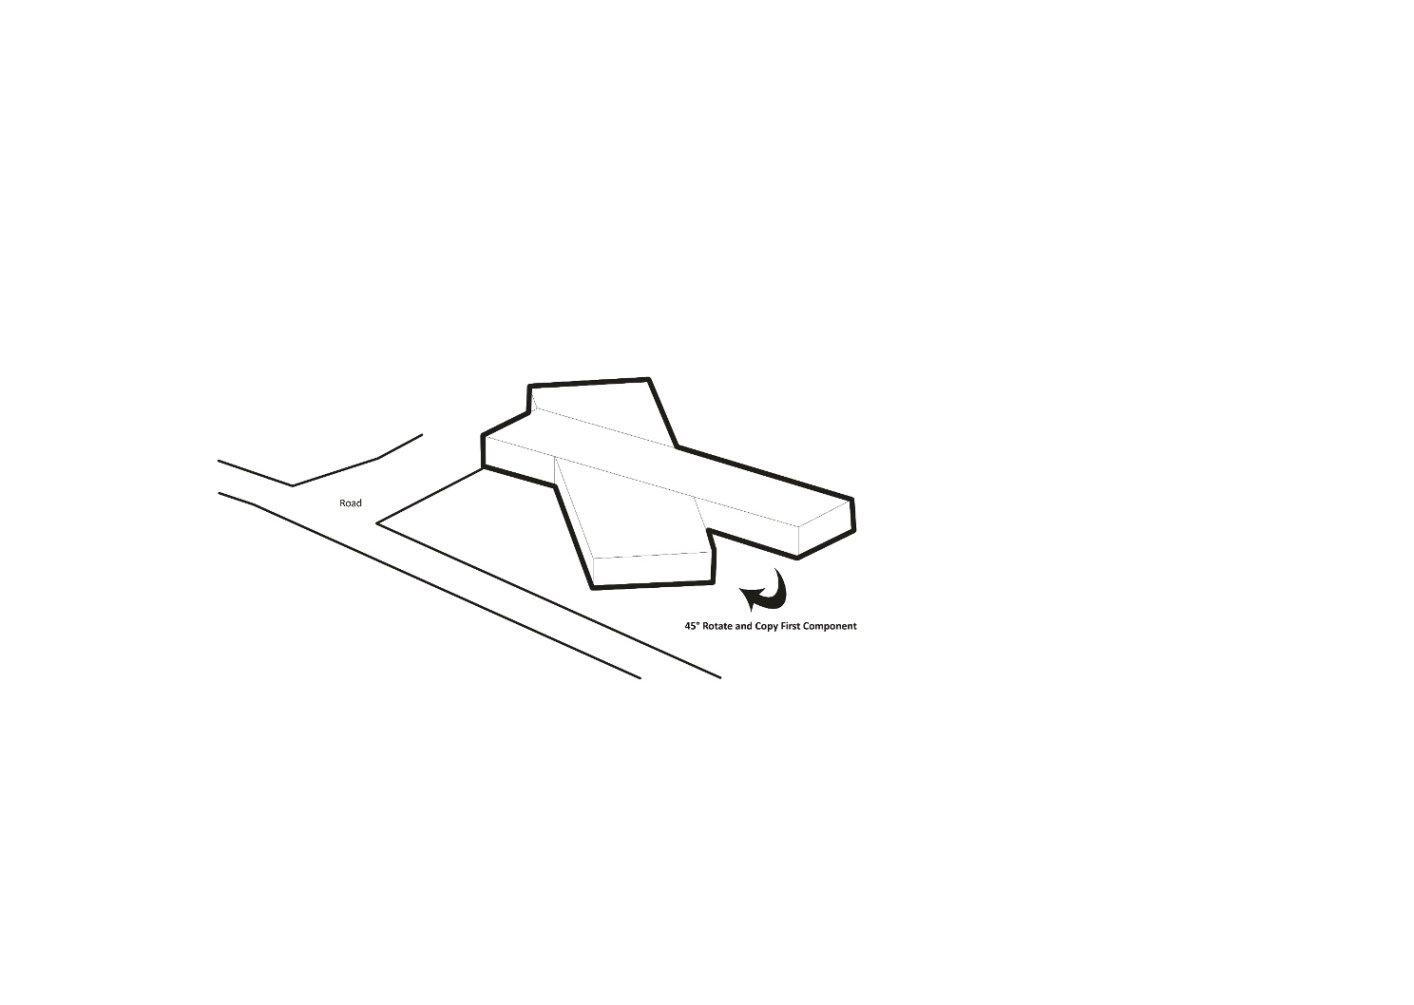 idea diagram 2 Wall Corporation}